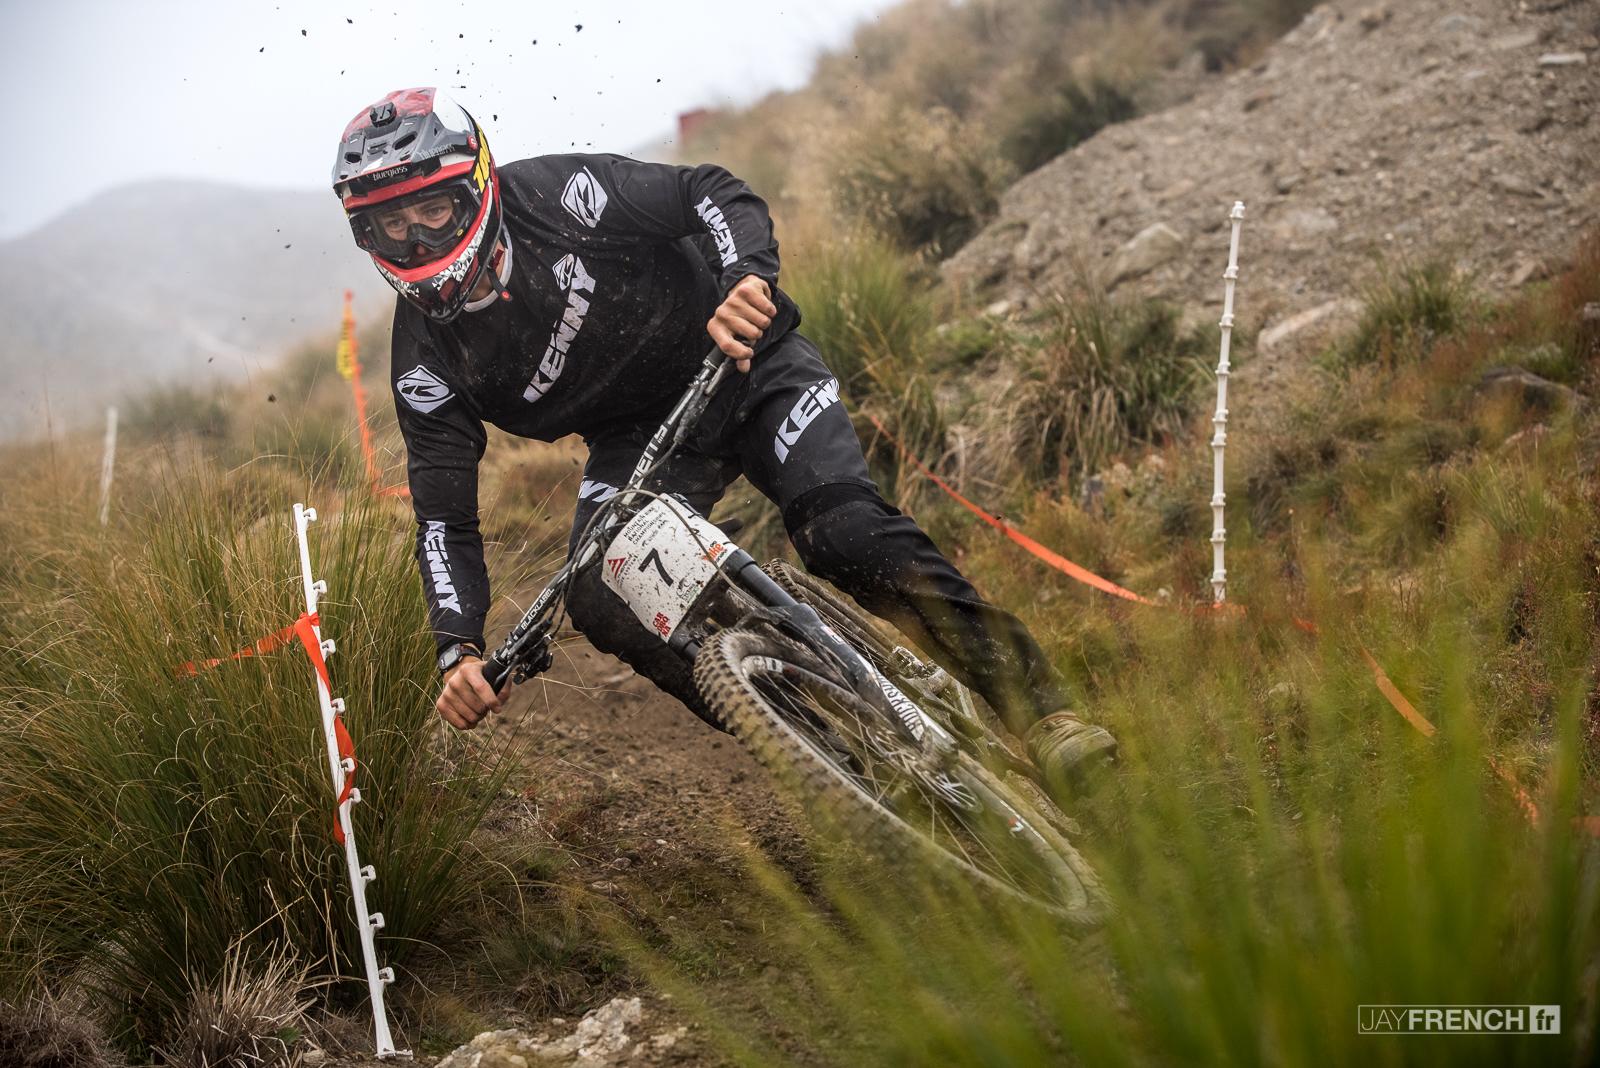 Norco Factory Racing - Sam Blenkinsop (10 of 15).jpg